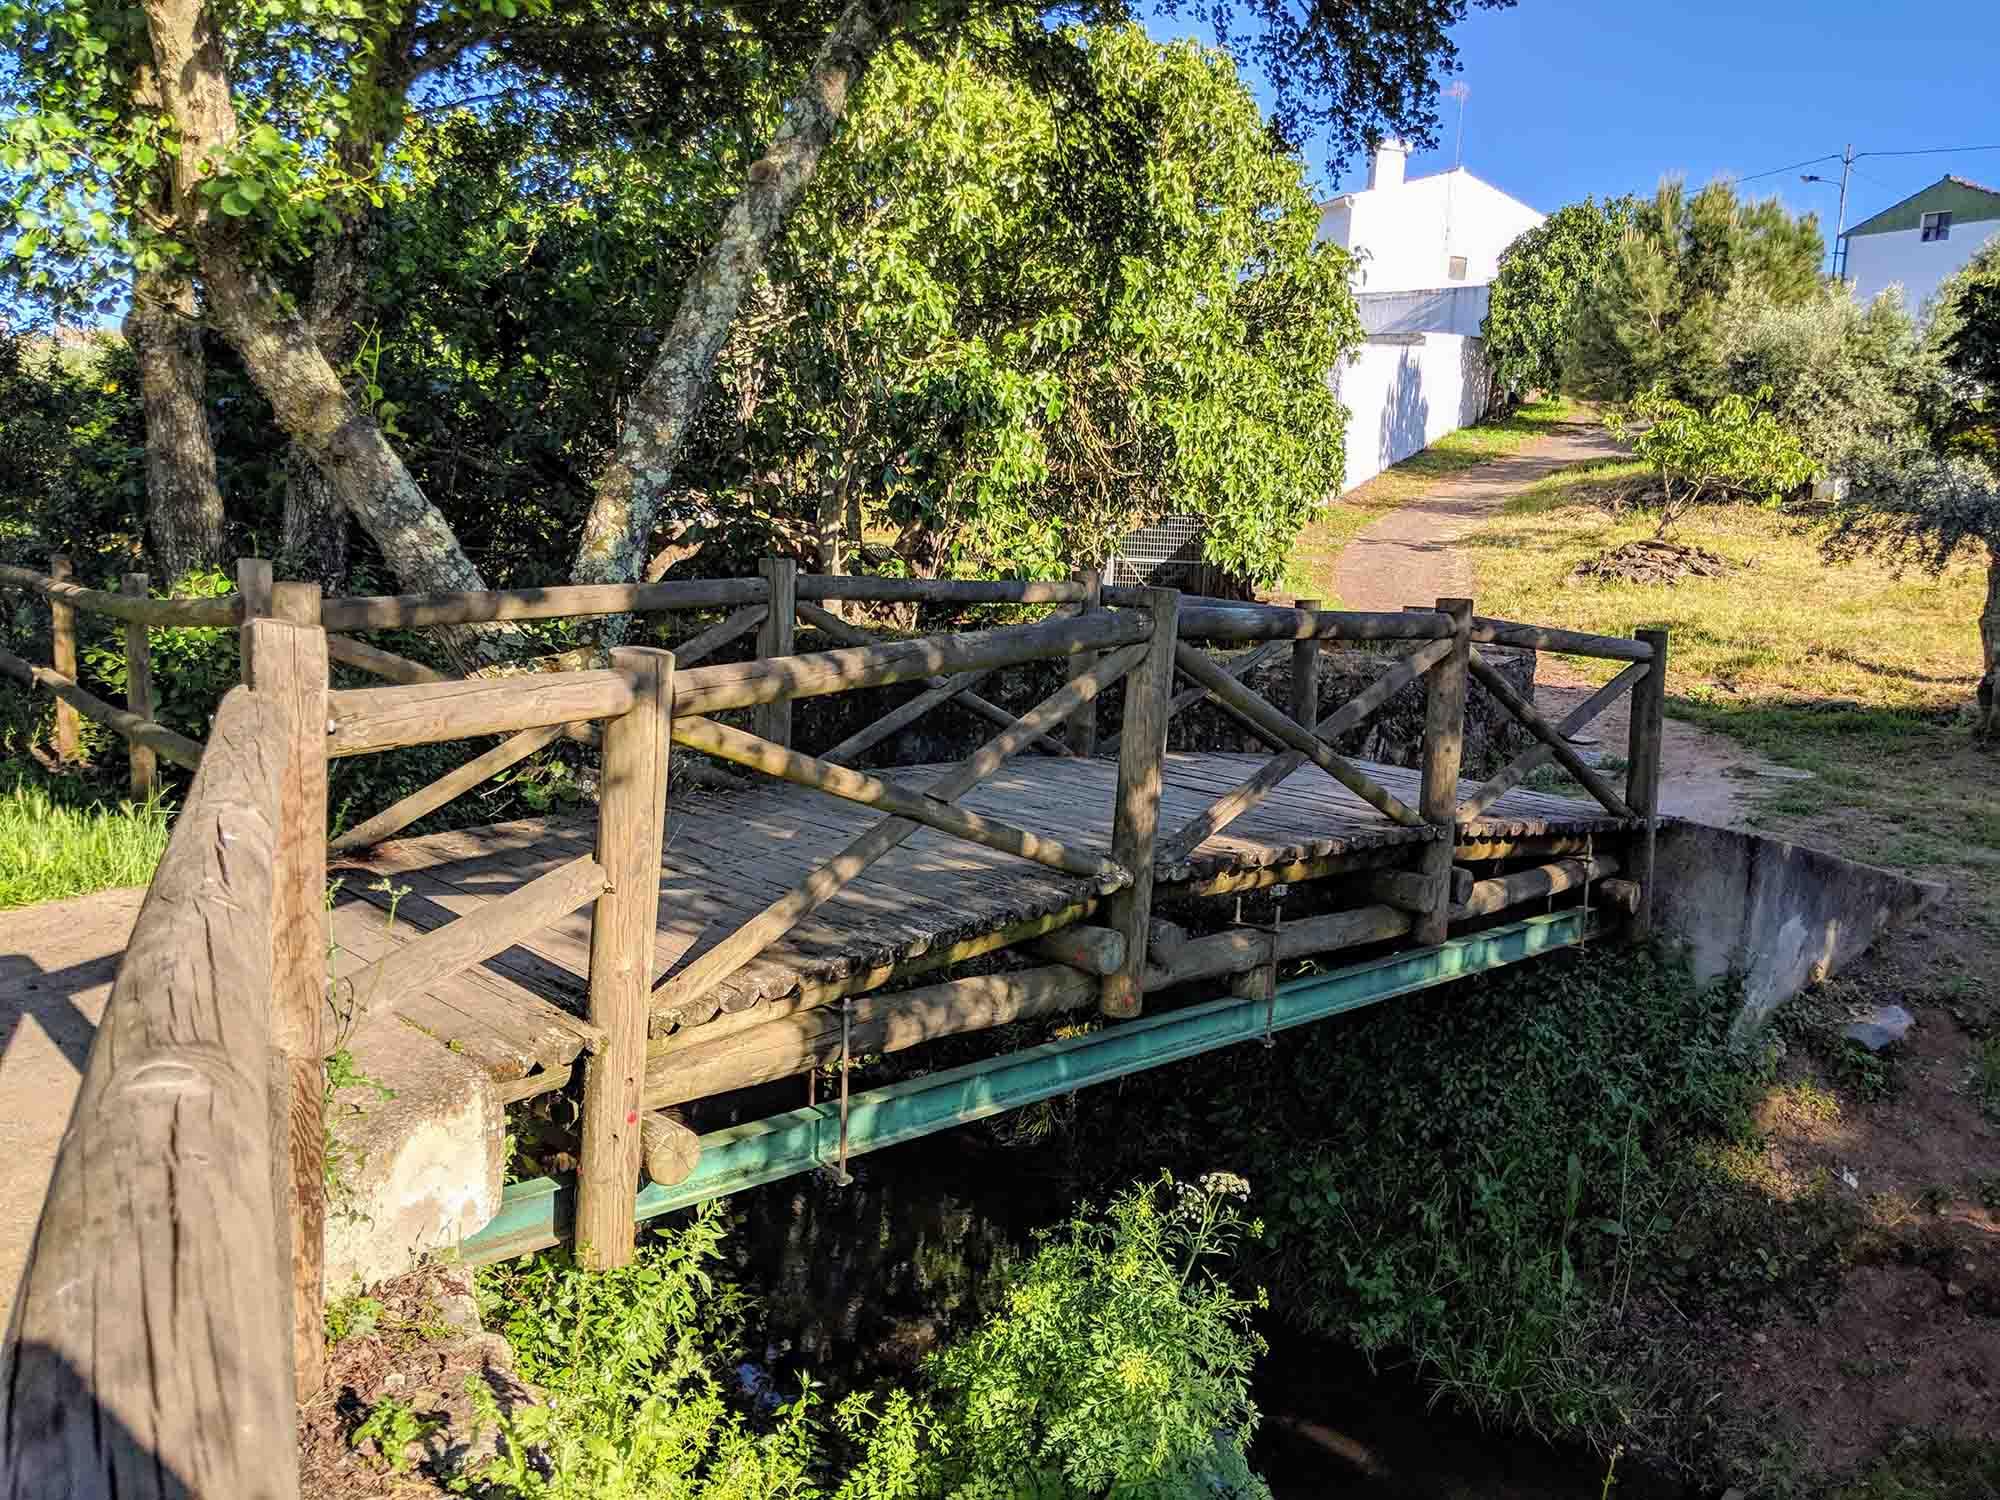 Worlds smallest bridge into Portugal